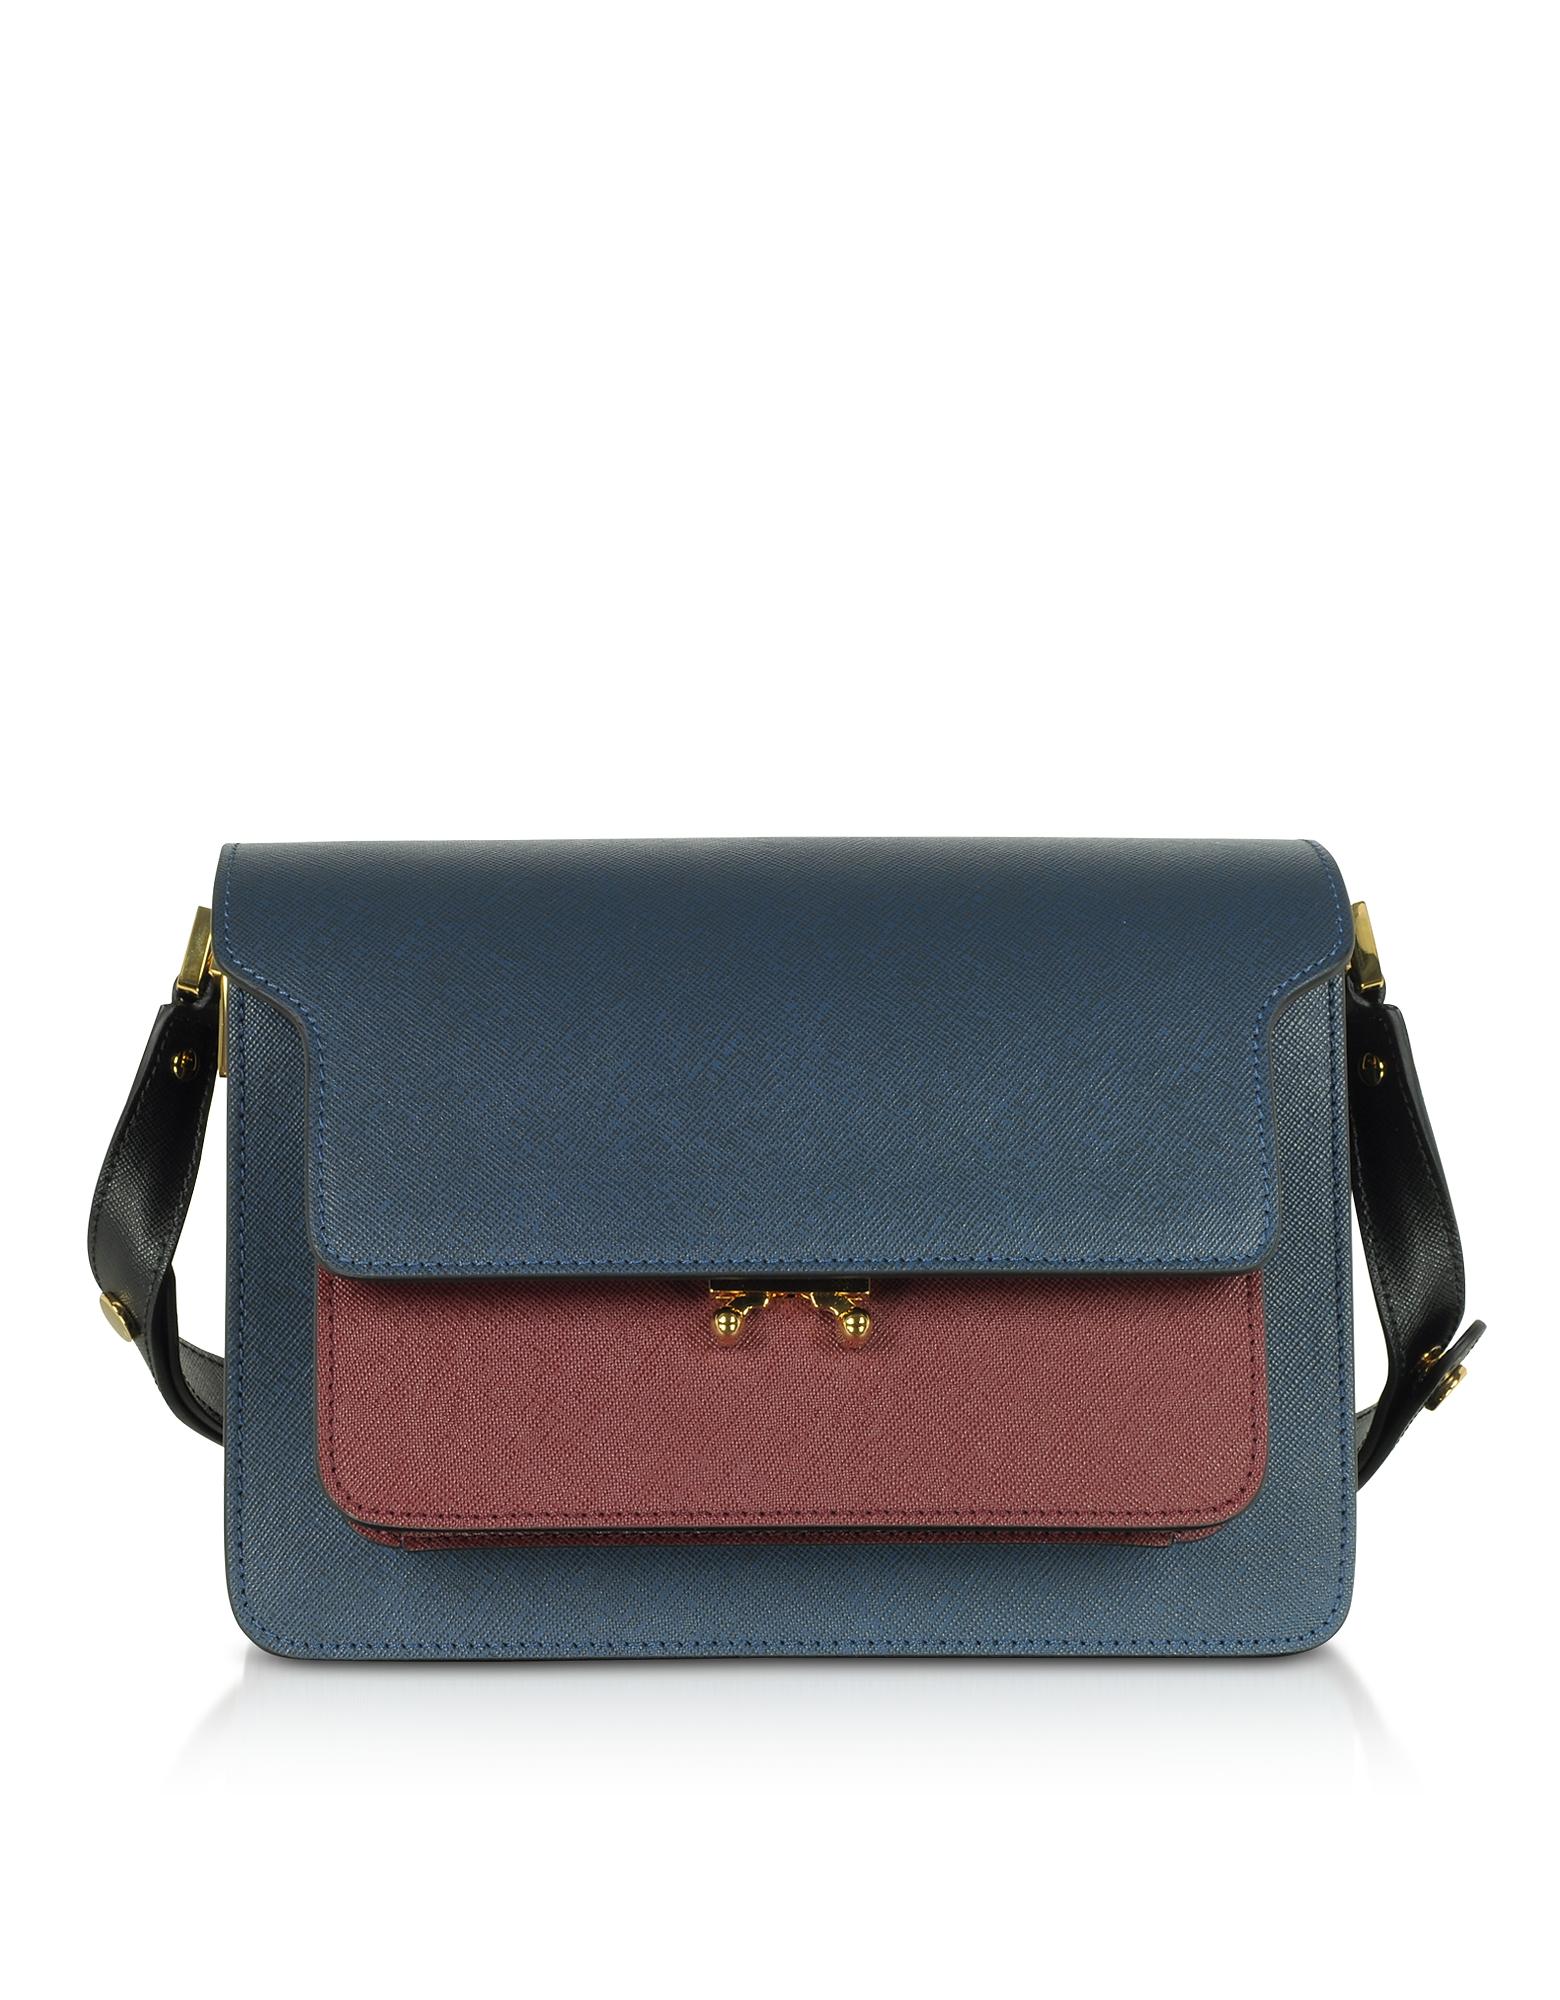 Marni Designer Handbags, Orion Blue, Black & Ruby Saffiano Calf Leather Trunk Bag